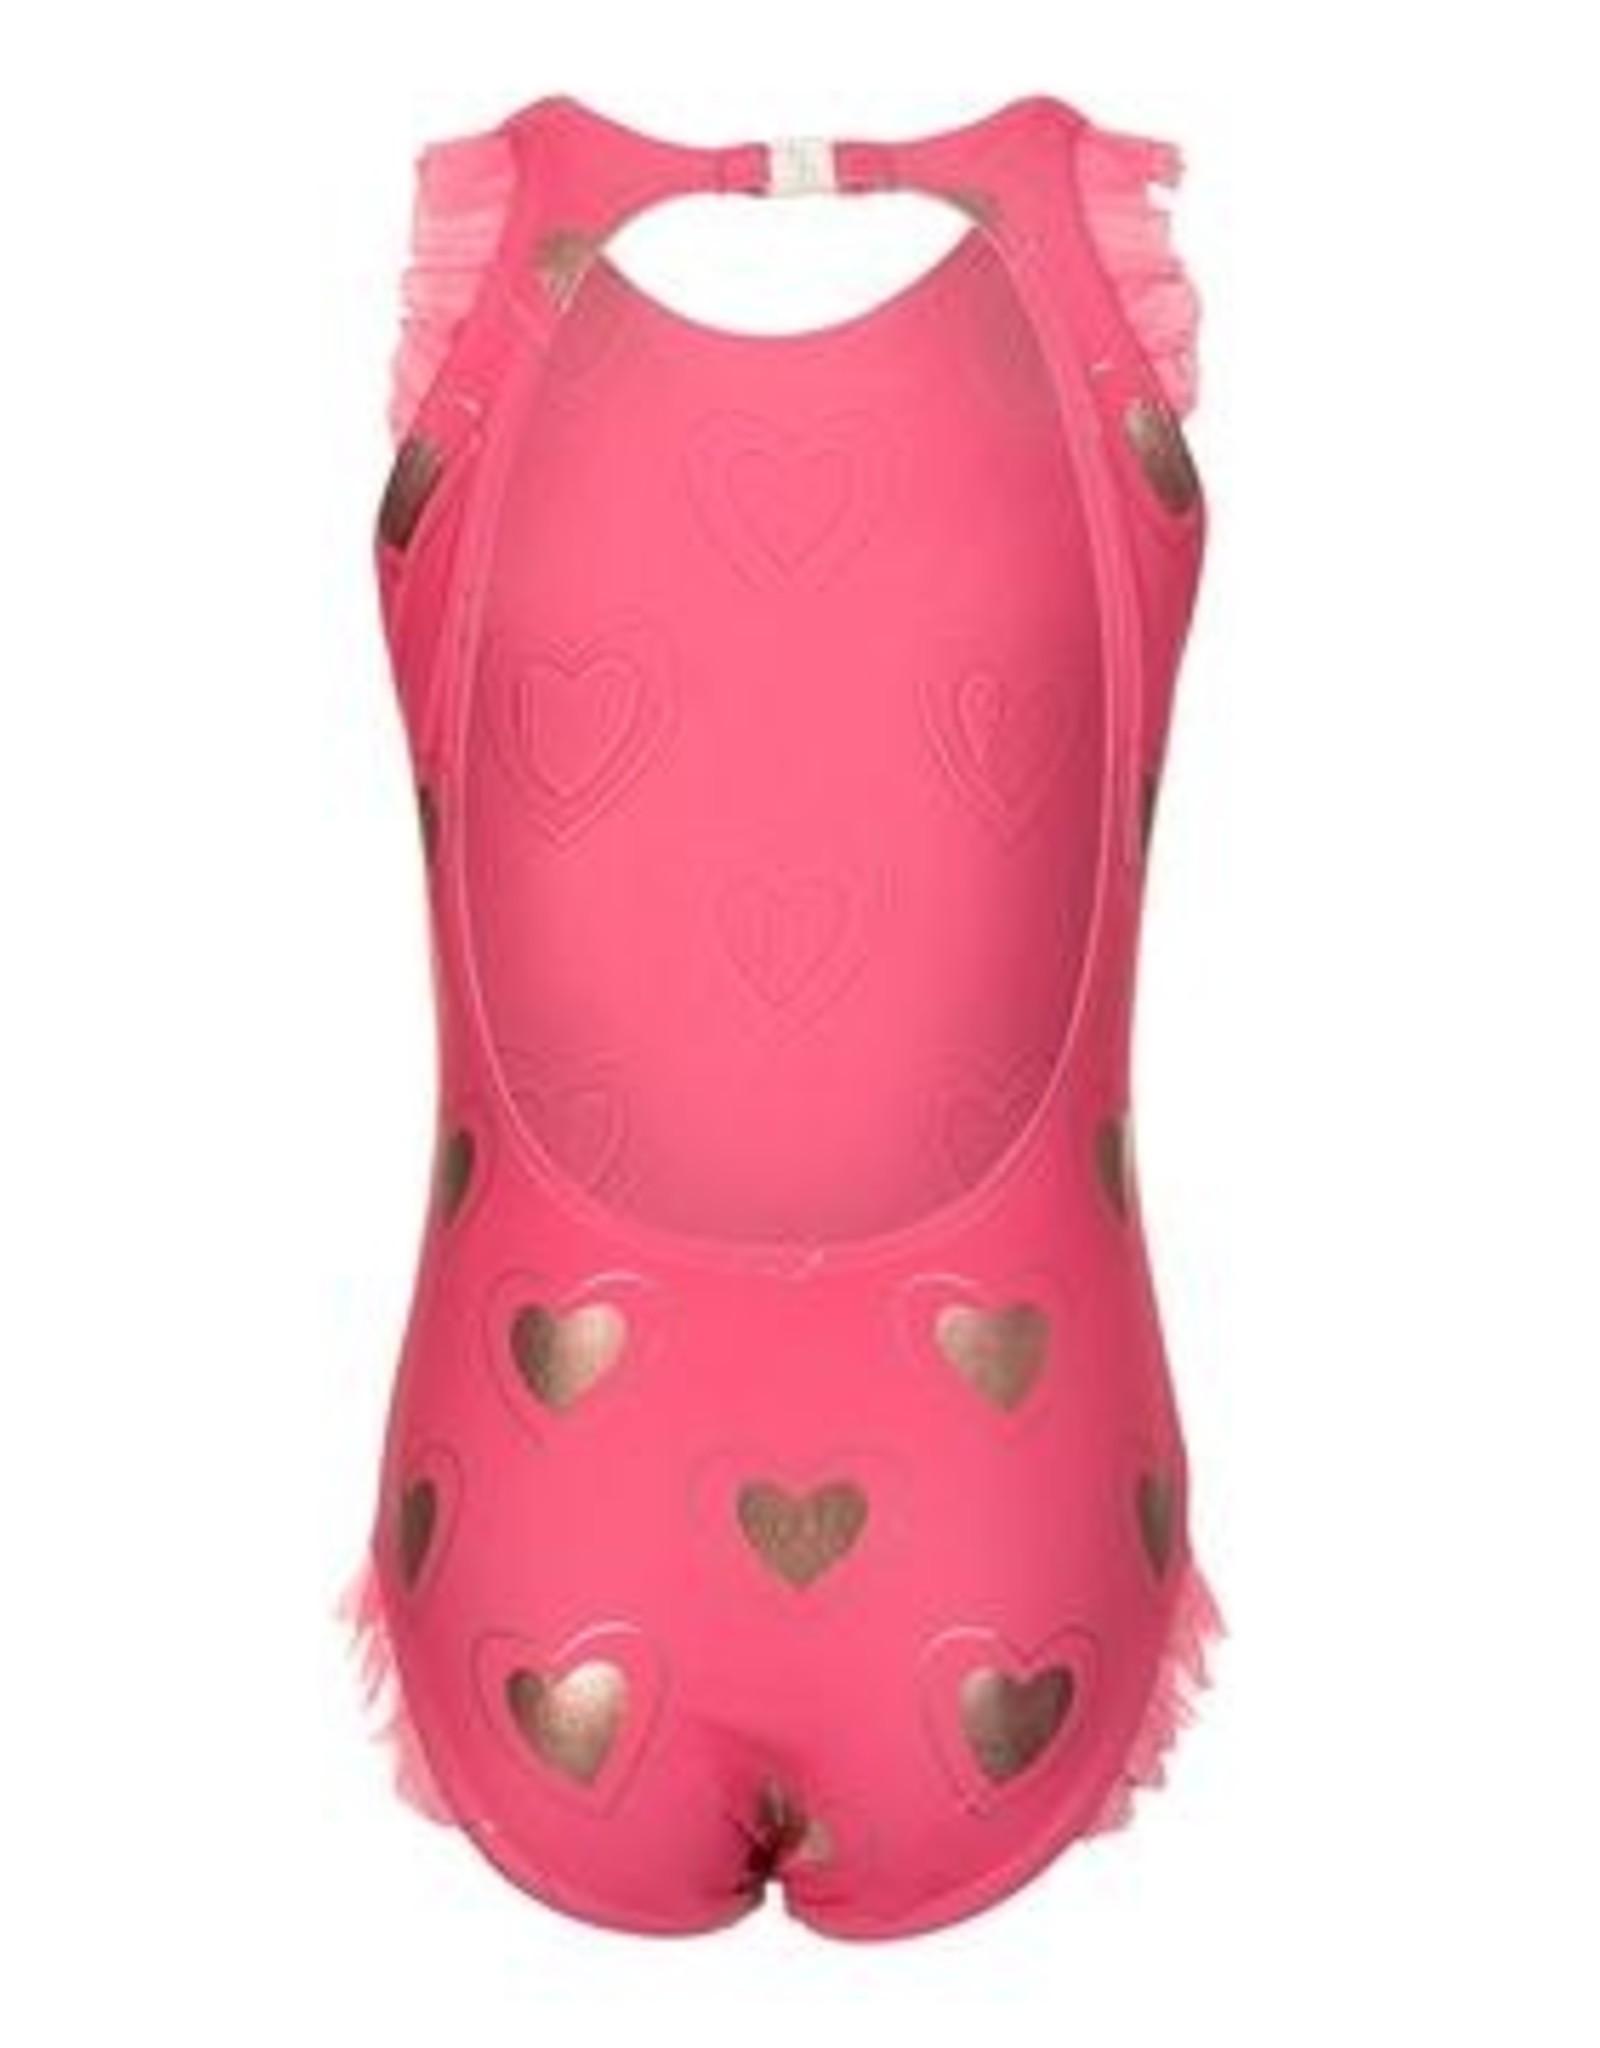 Appaman Appaman Calla Swimsuit